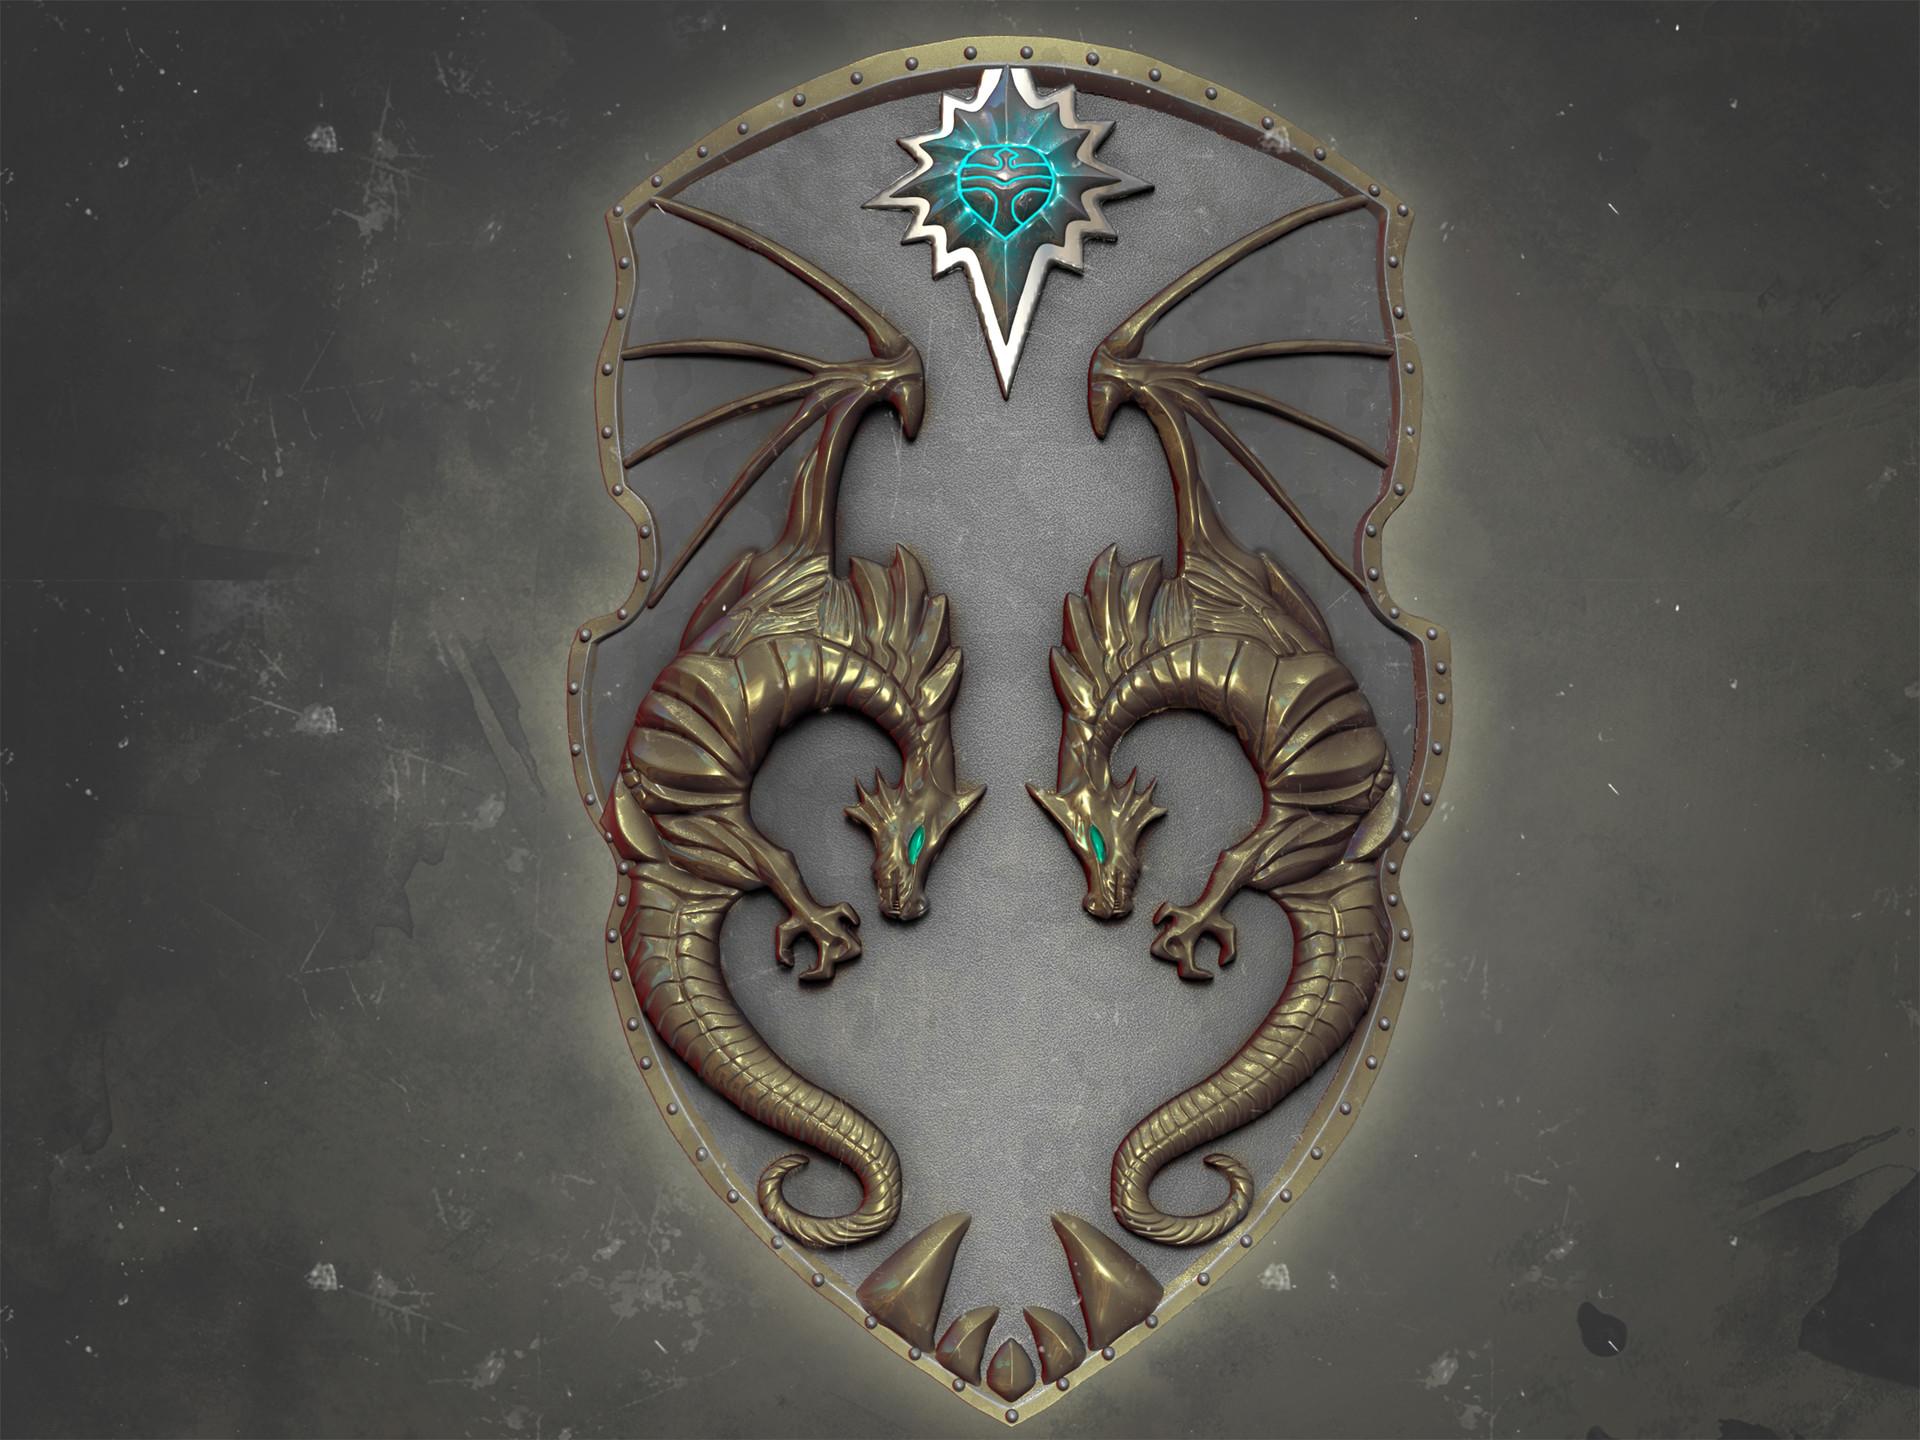 ArtStation - Fantasy Dragon Shield, Virendra Shekhawat Vj